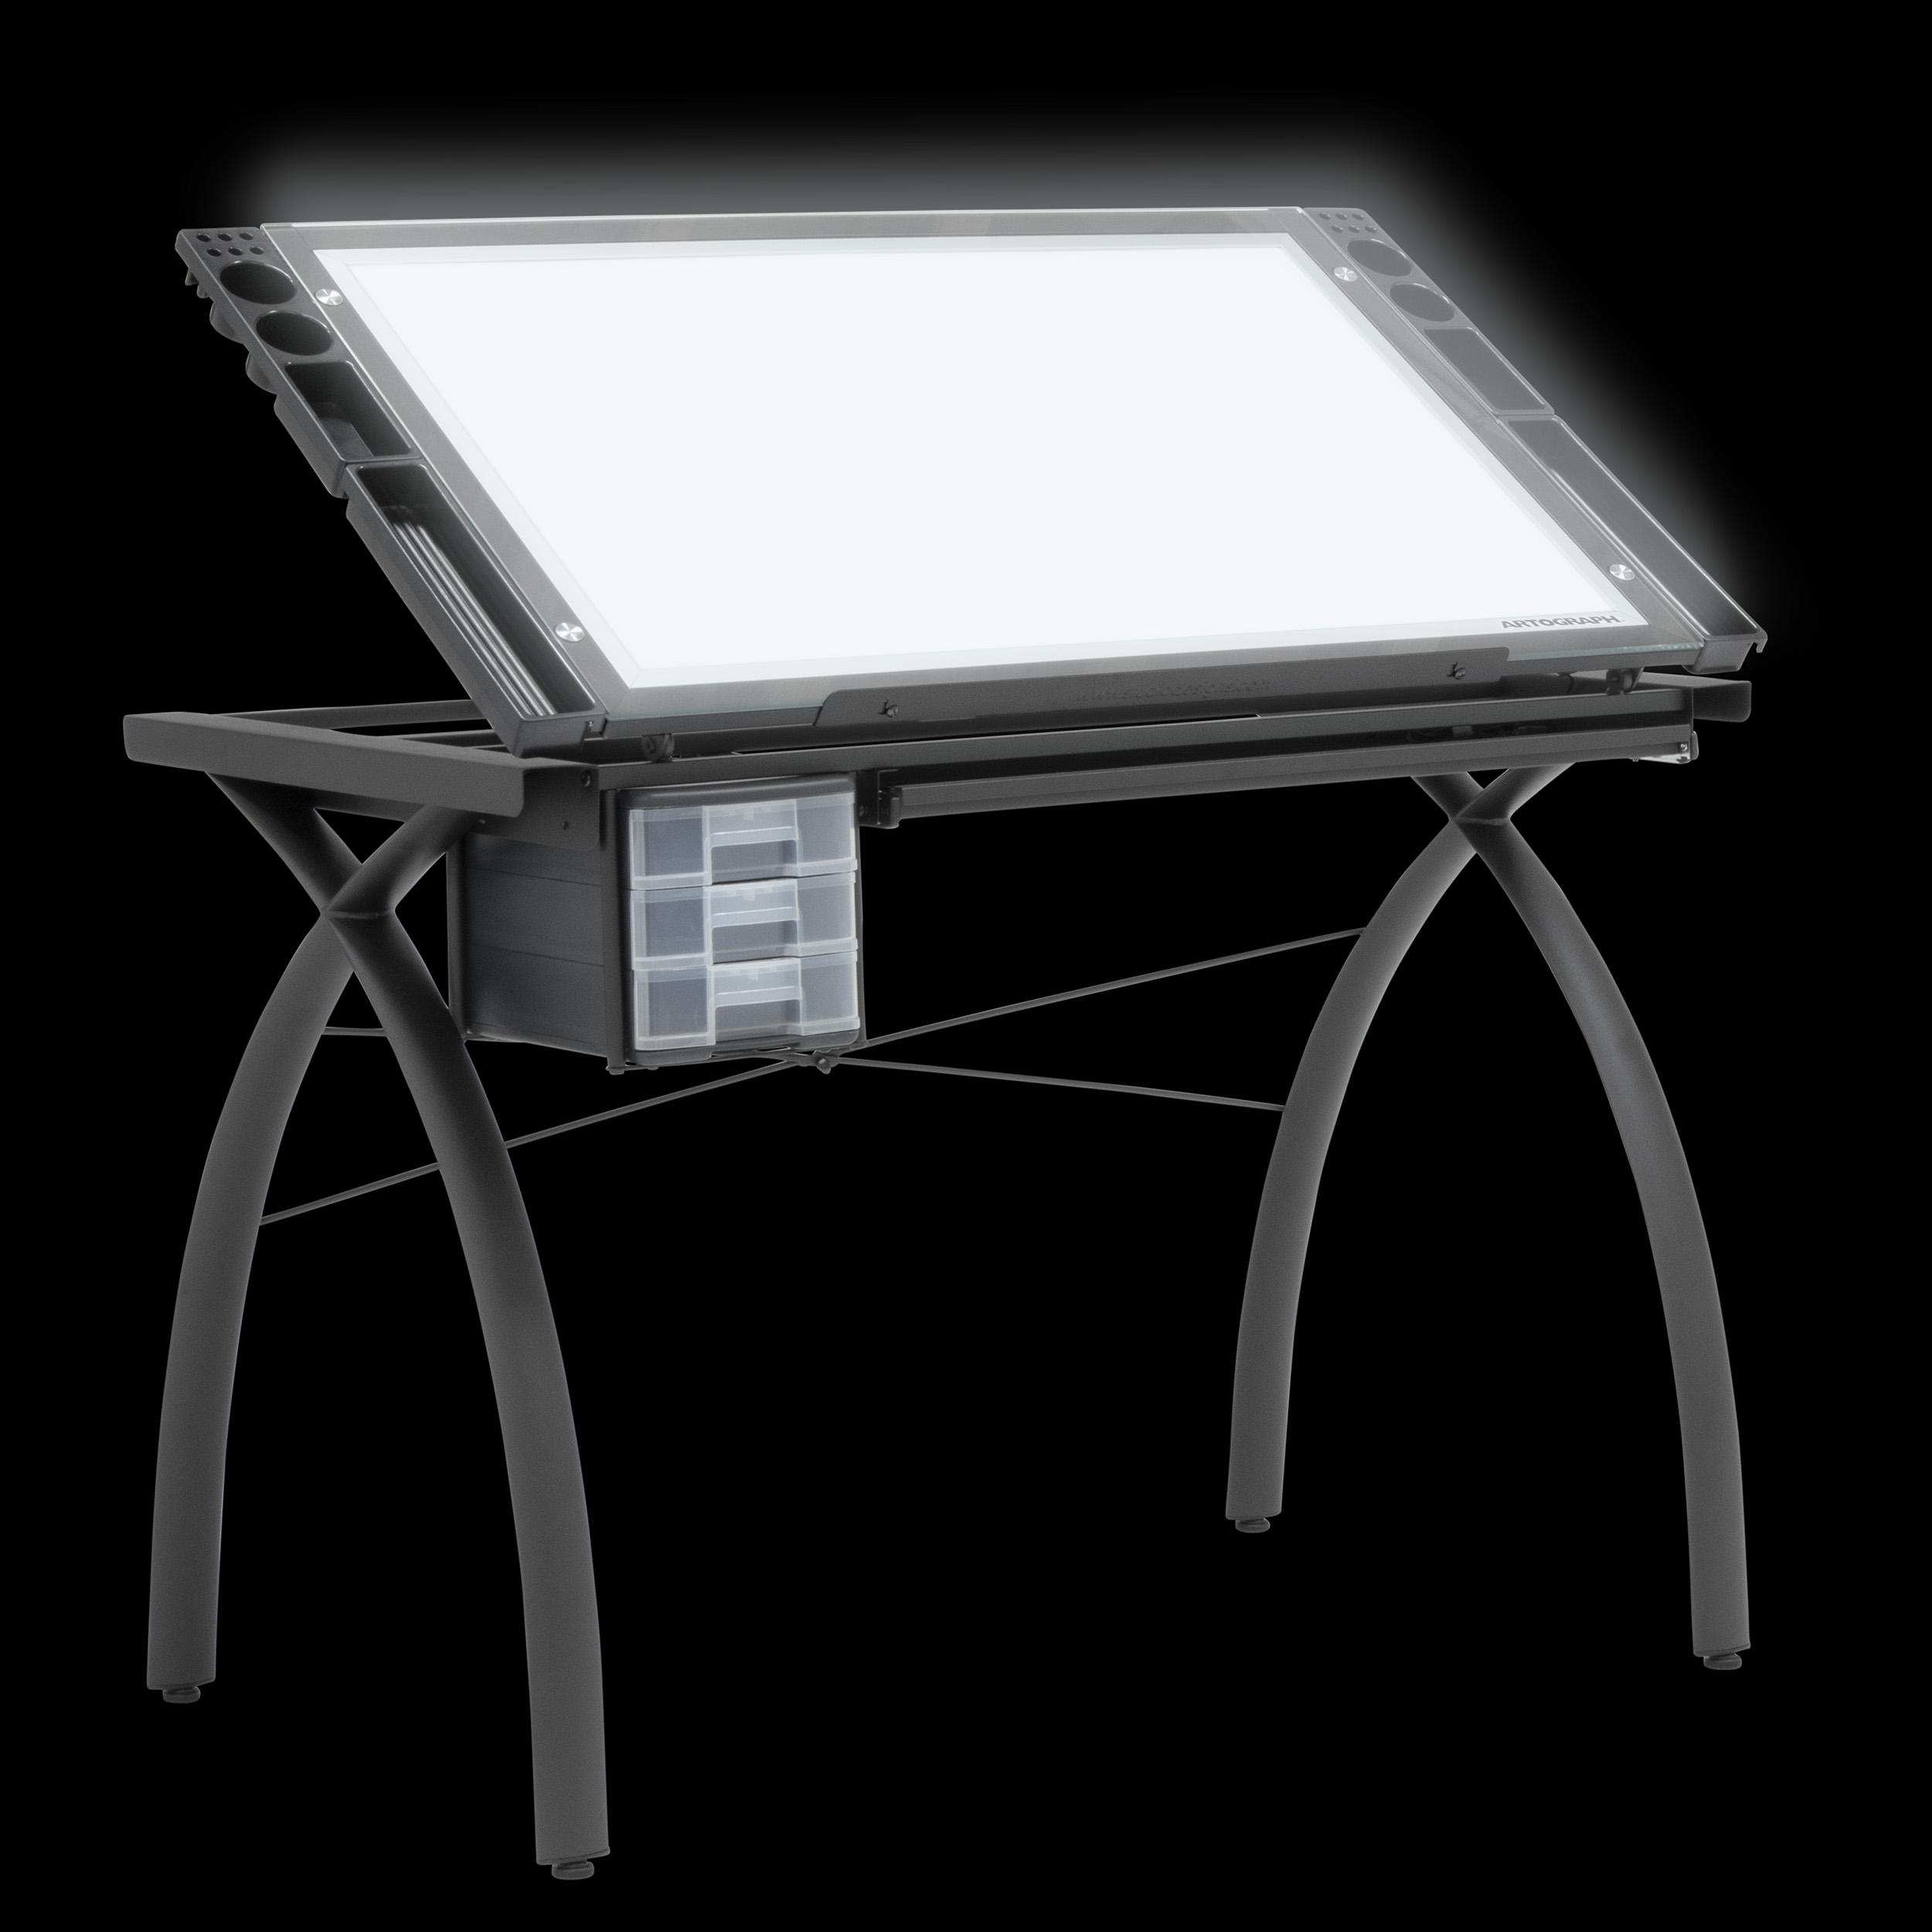 10062-Artograph-Futura-Light-Table-on